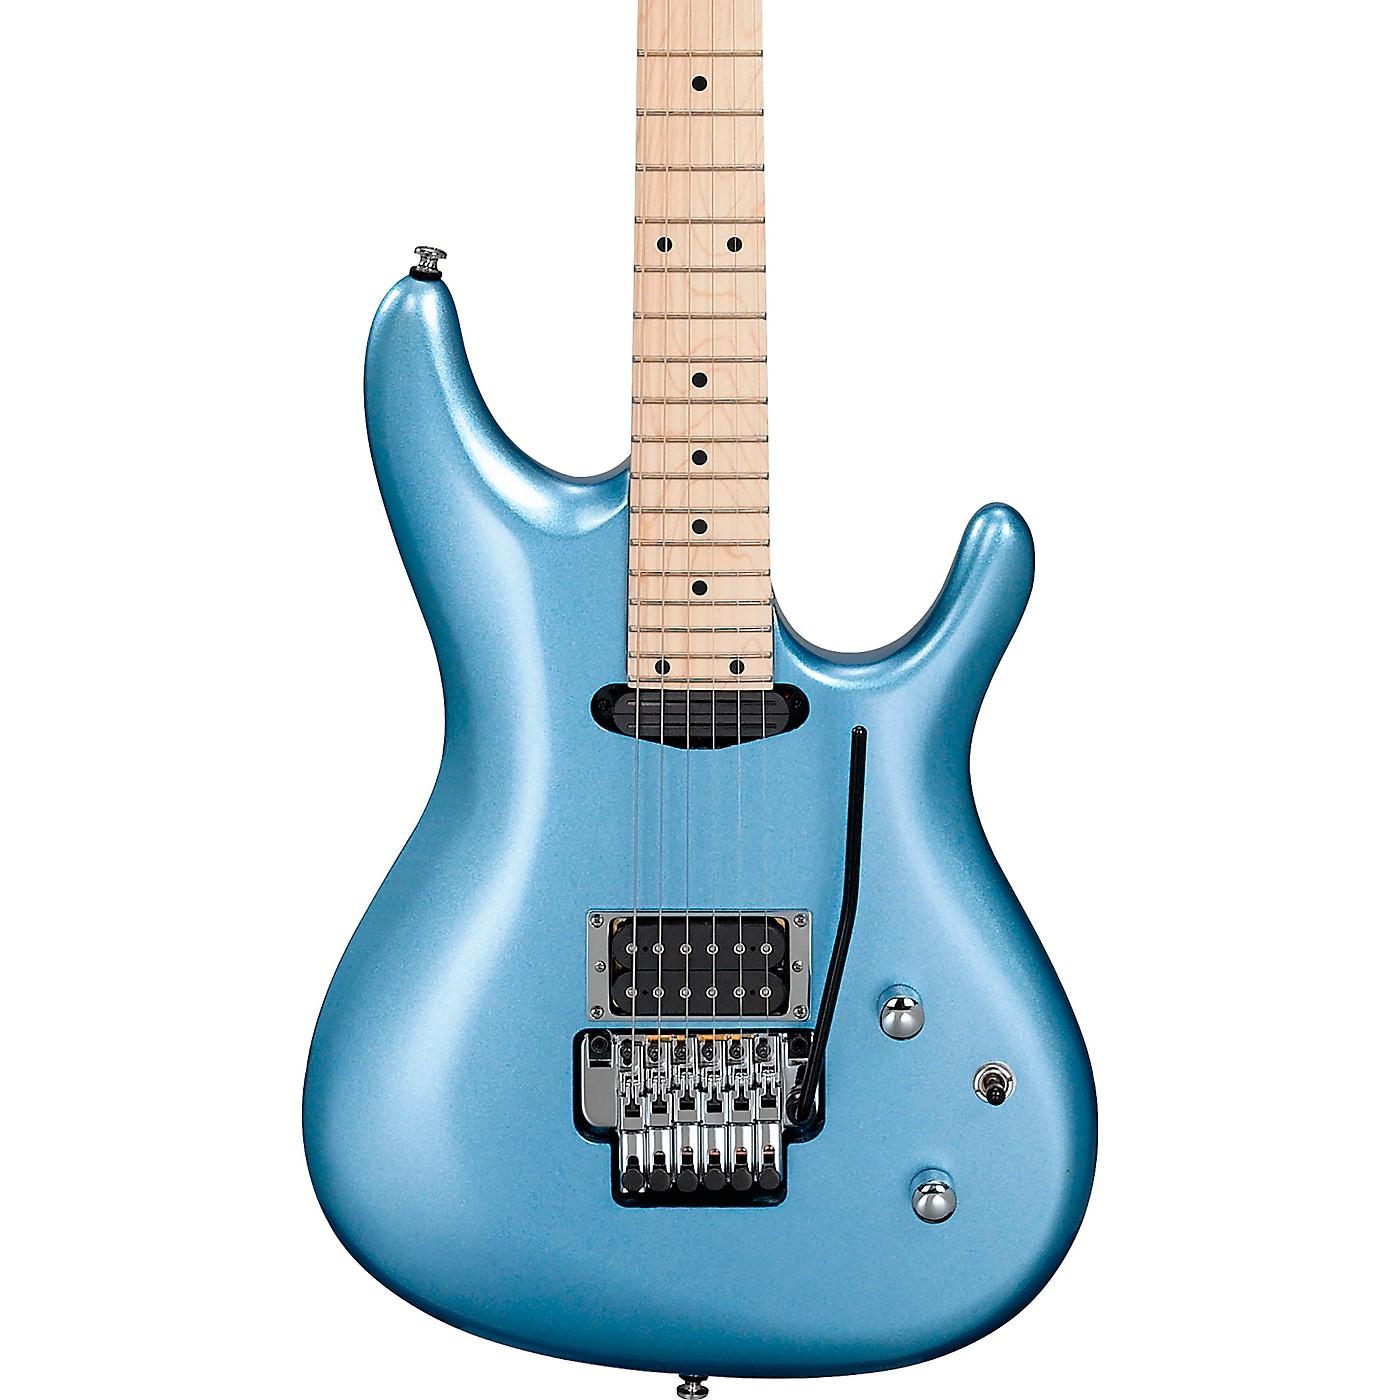 Ibanez JS140M Joe Satriani Signature Electric Guitar thumbnail